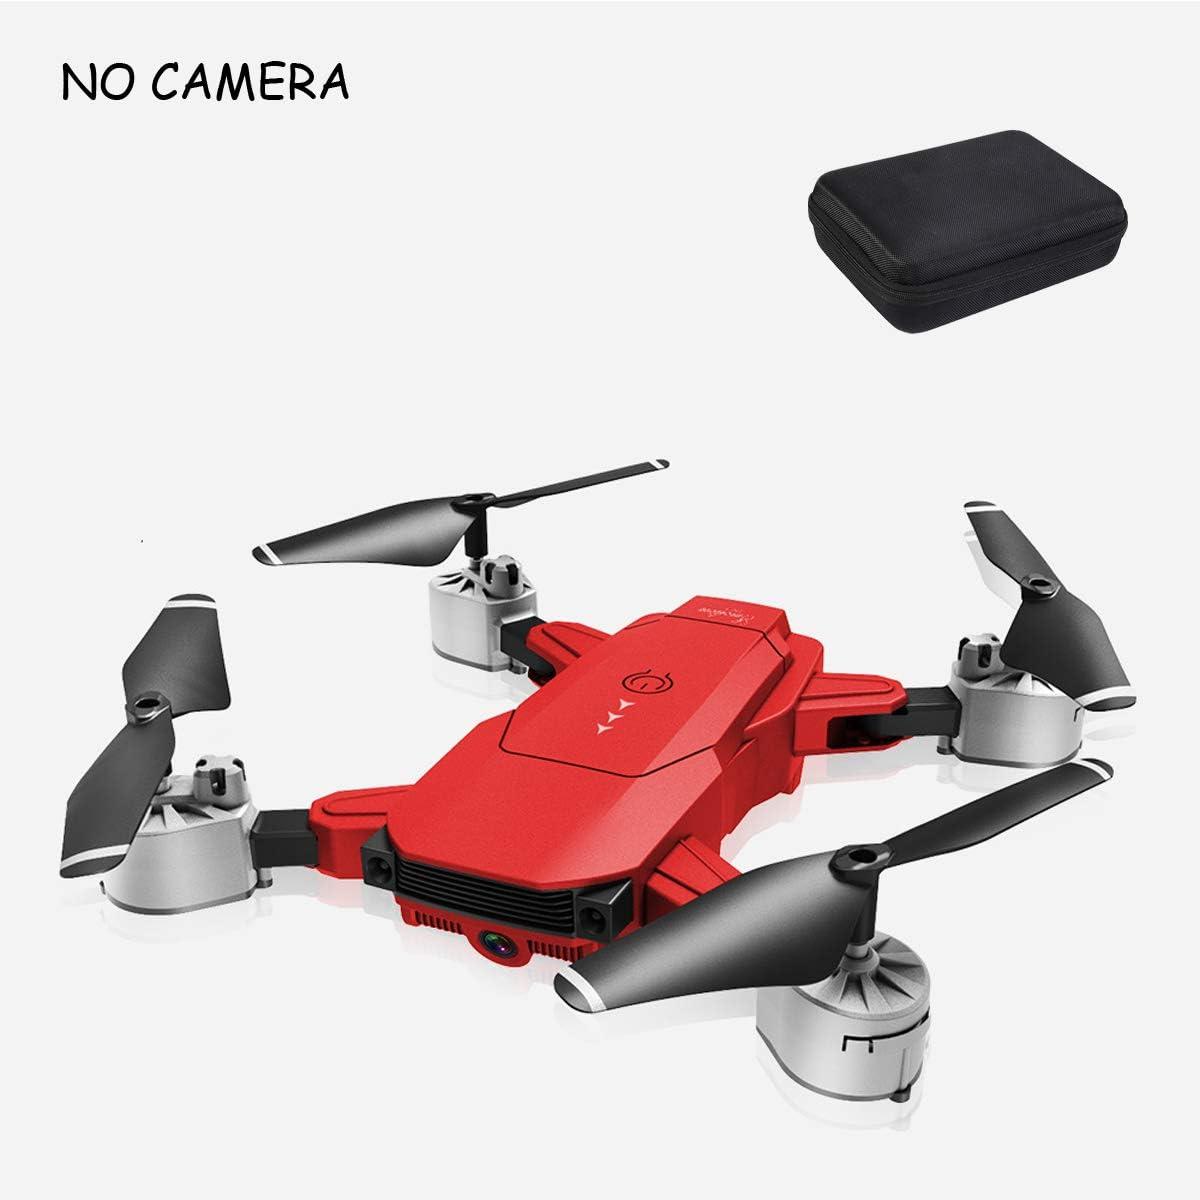 Muccy Portátil Drones para Niños con Luces, Control de Largo Alcance Quadcopter, RC Cuadricóptero Control de Altura, G-Sensor, Modo sin Cabeza, 6 Canales Drone para Principiantes